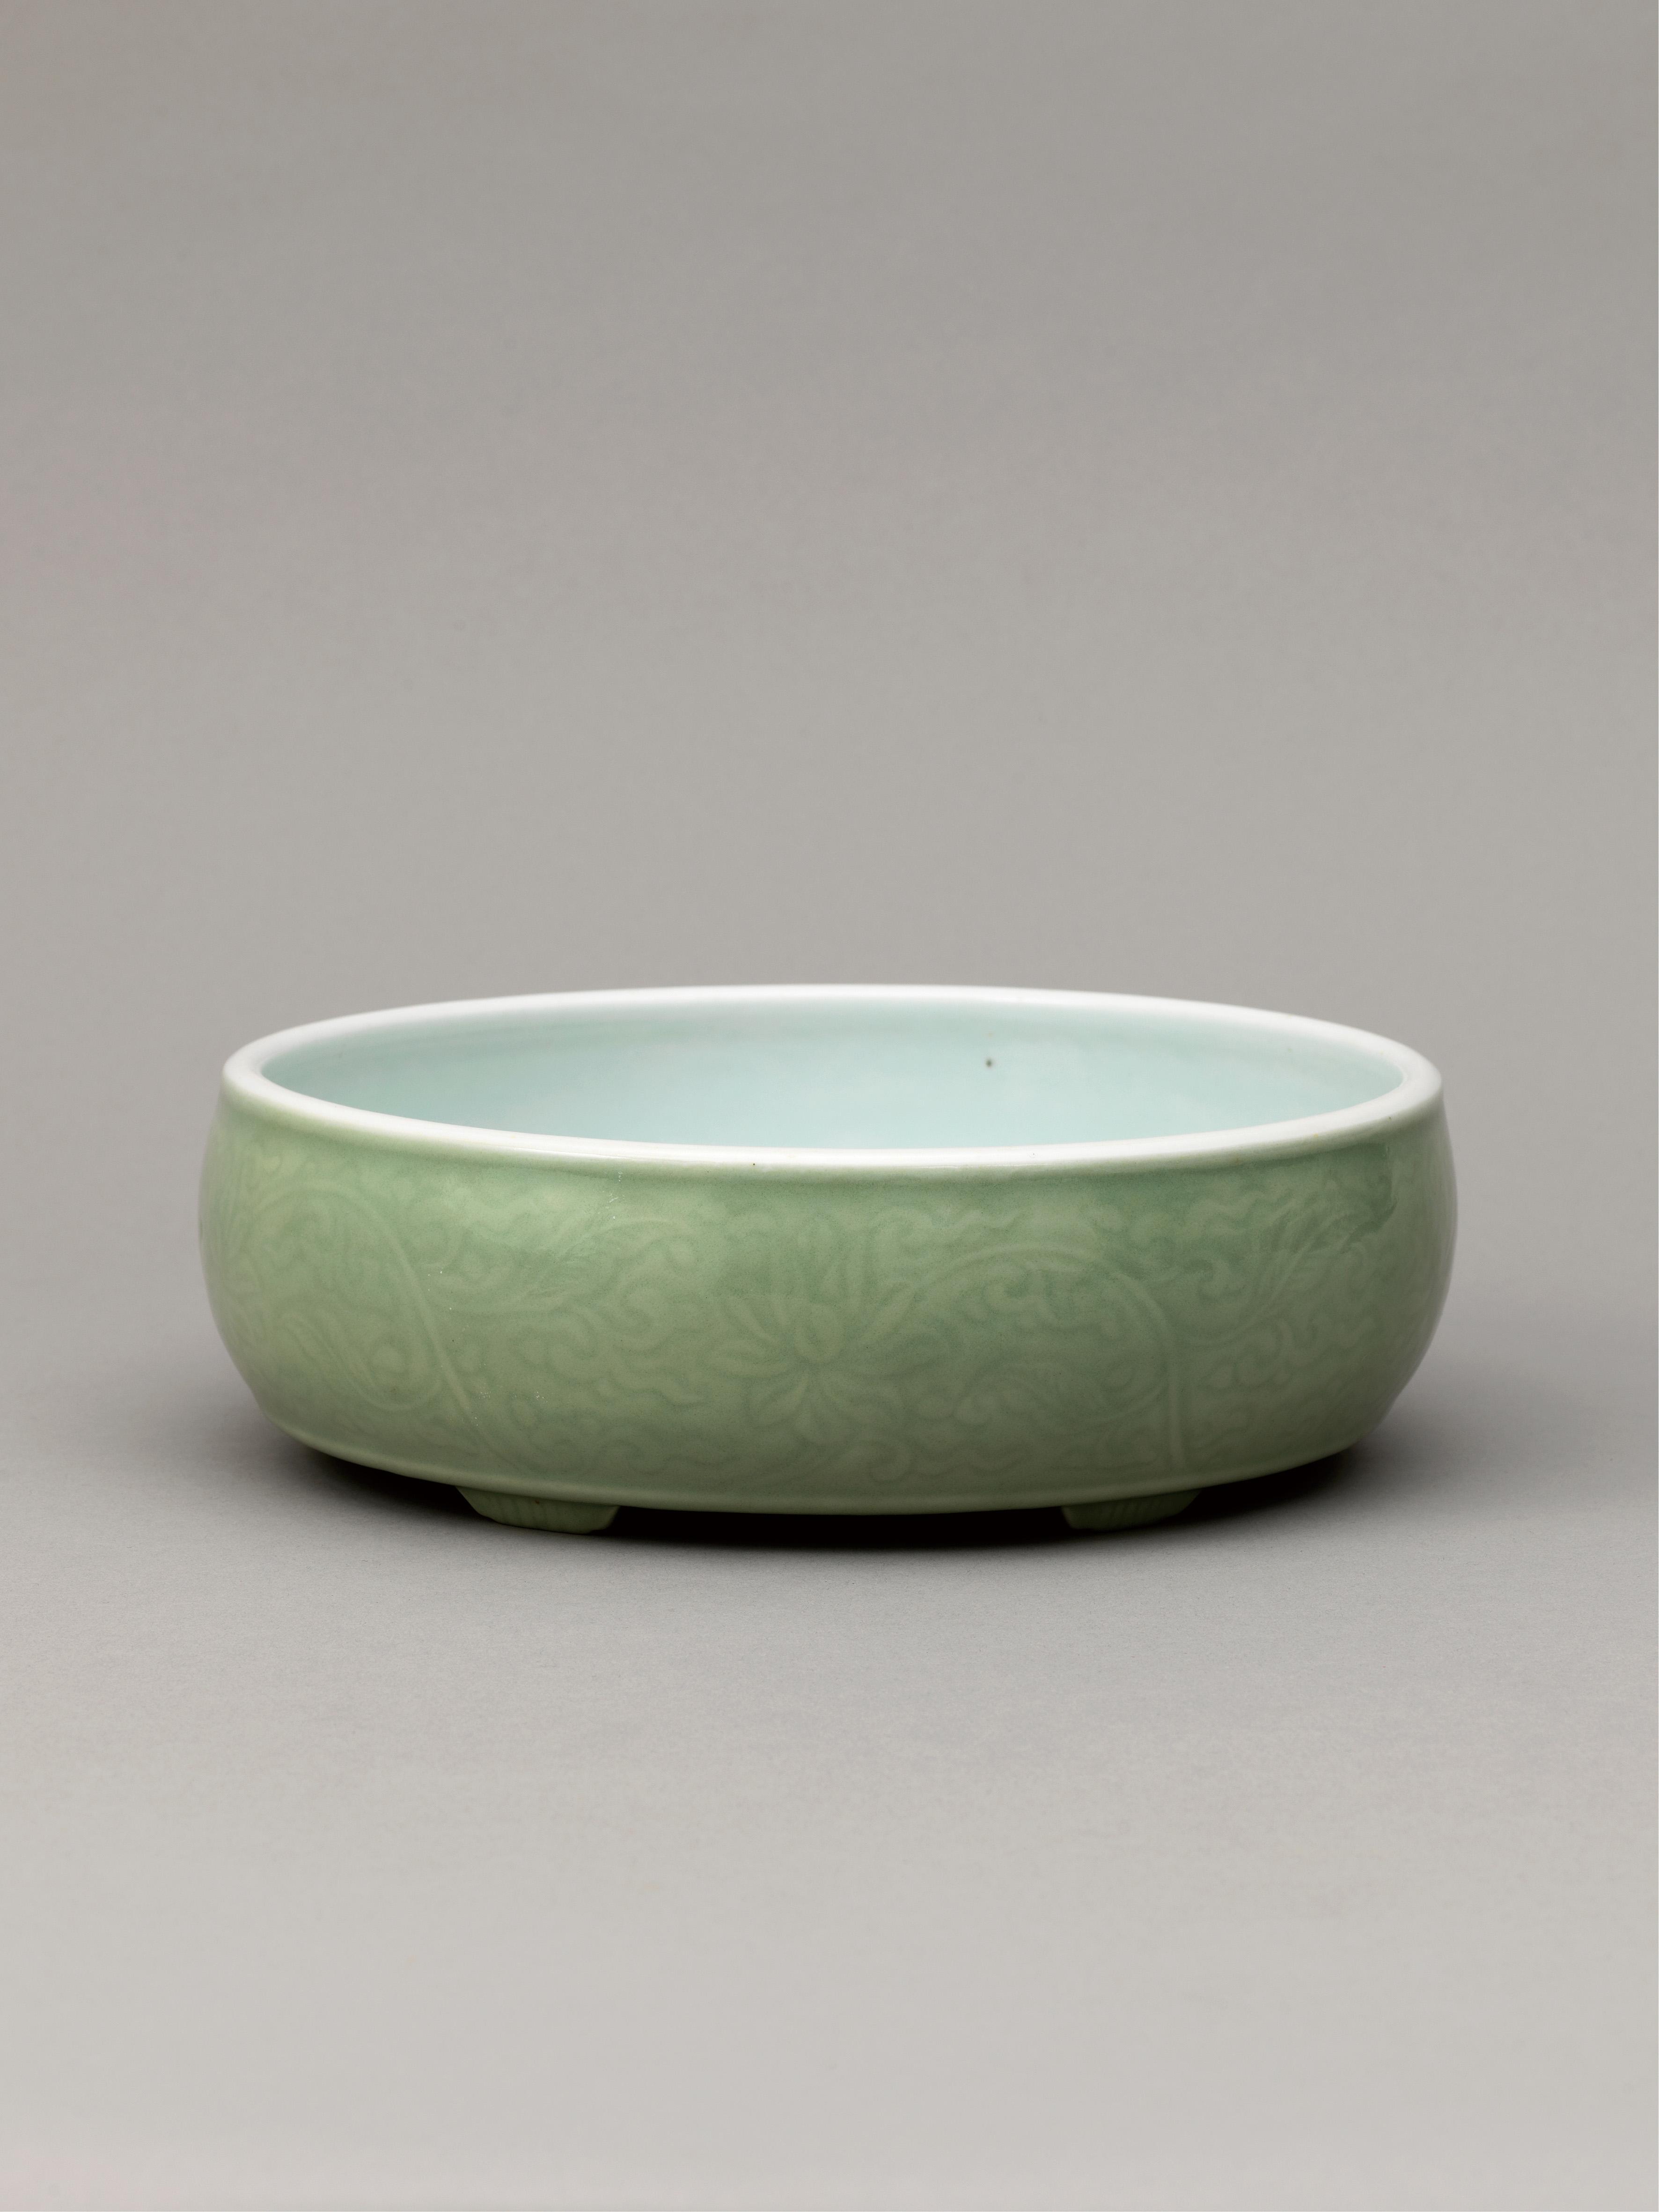 Lot 6 - A pale green glazed brush washer, Qing Dynasty, Qianlong Period (1736-1795)